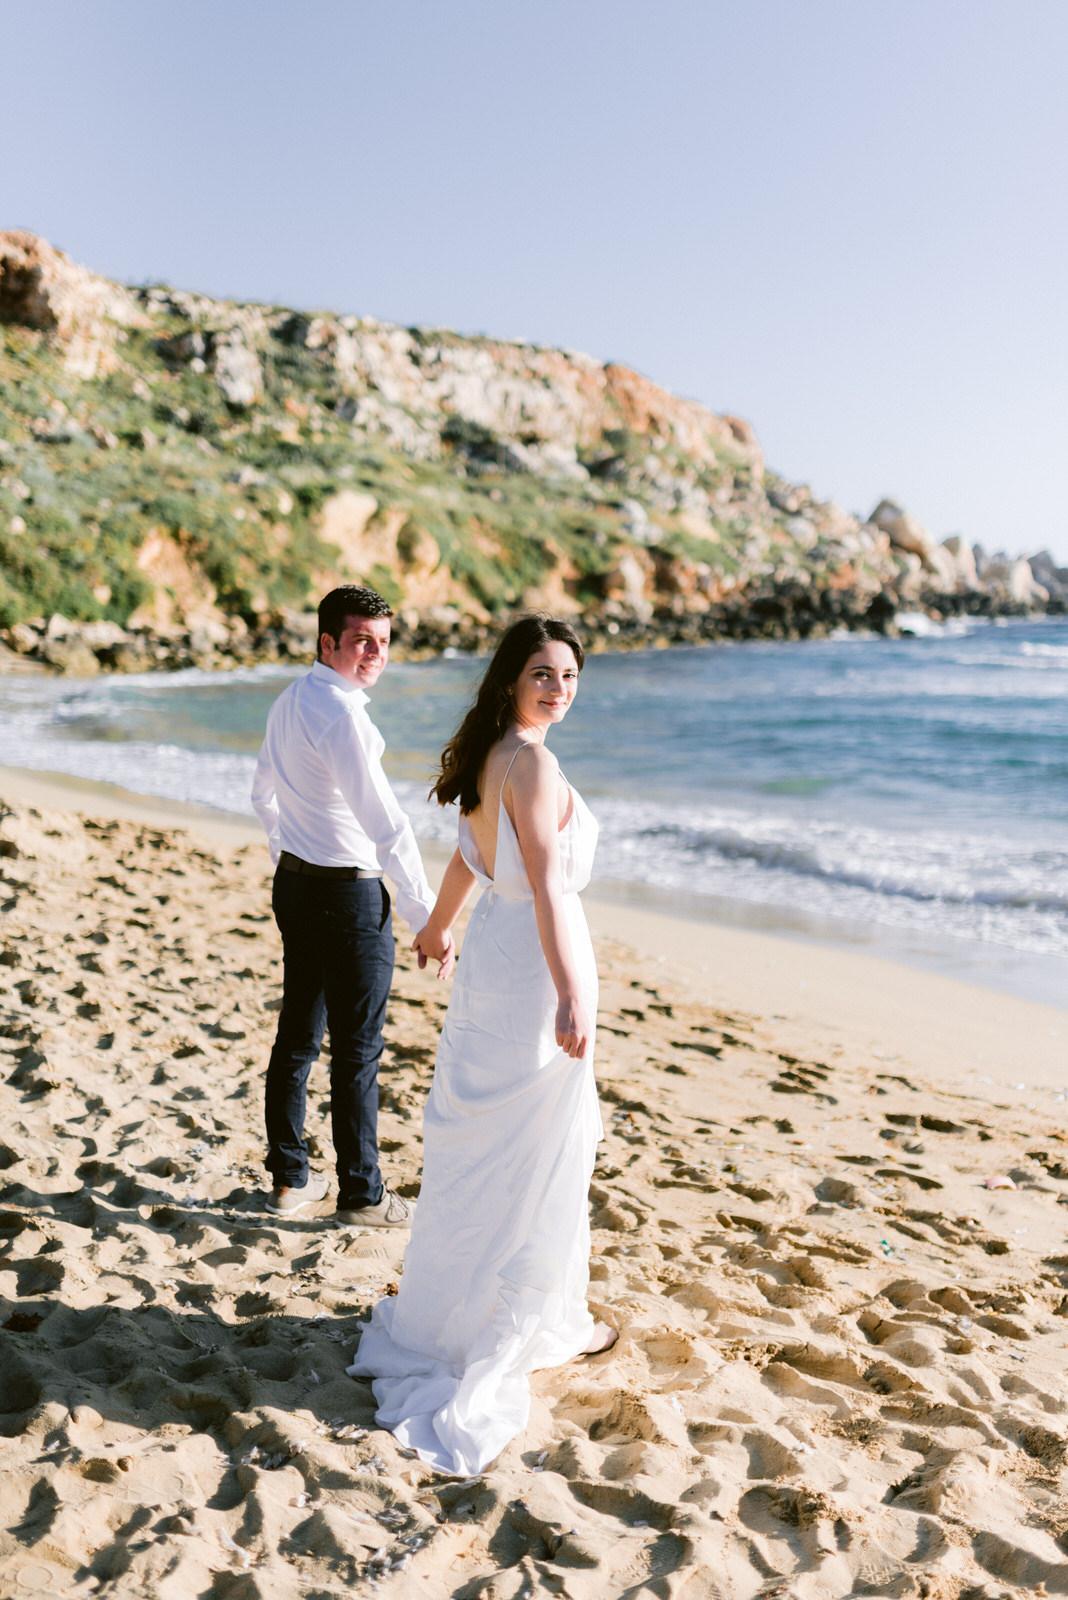 mdina wedding, malta wedding photography, malta elopement, golden bay malta wedding photos, wedding photographer malta, malta wedding venue, villa bologna wedding (55).jpg